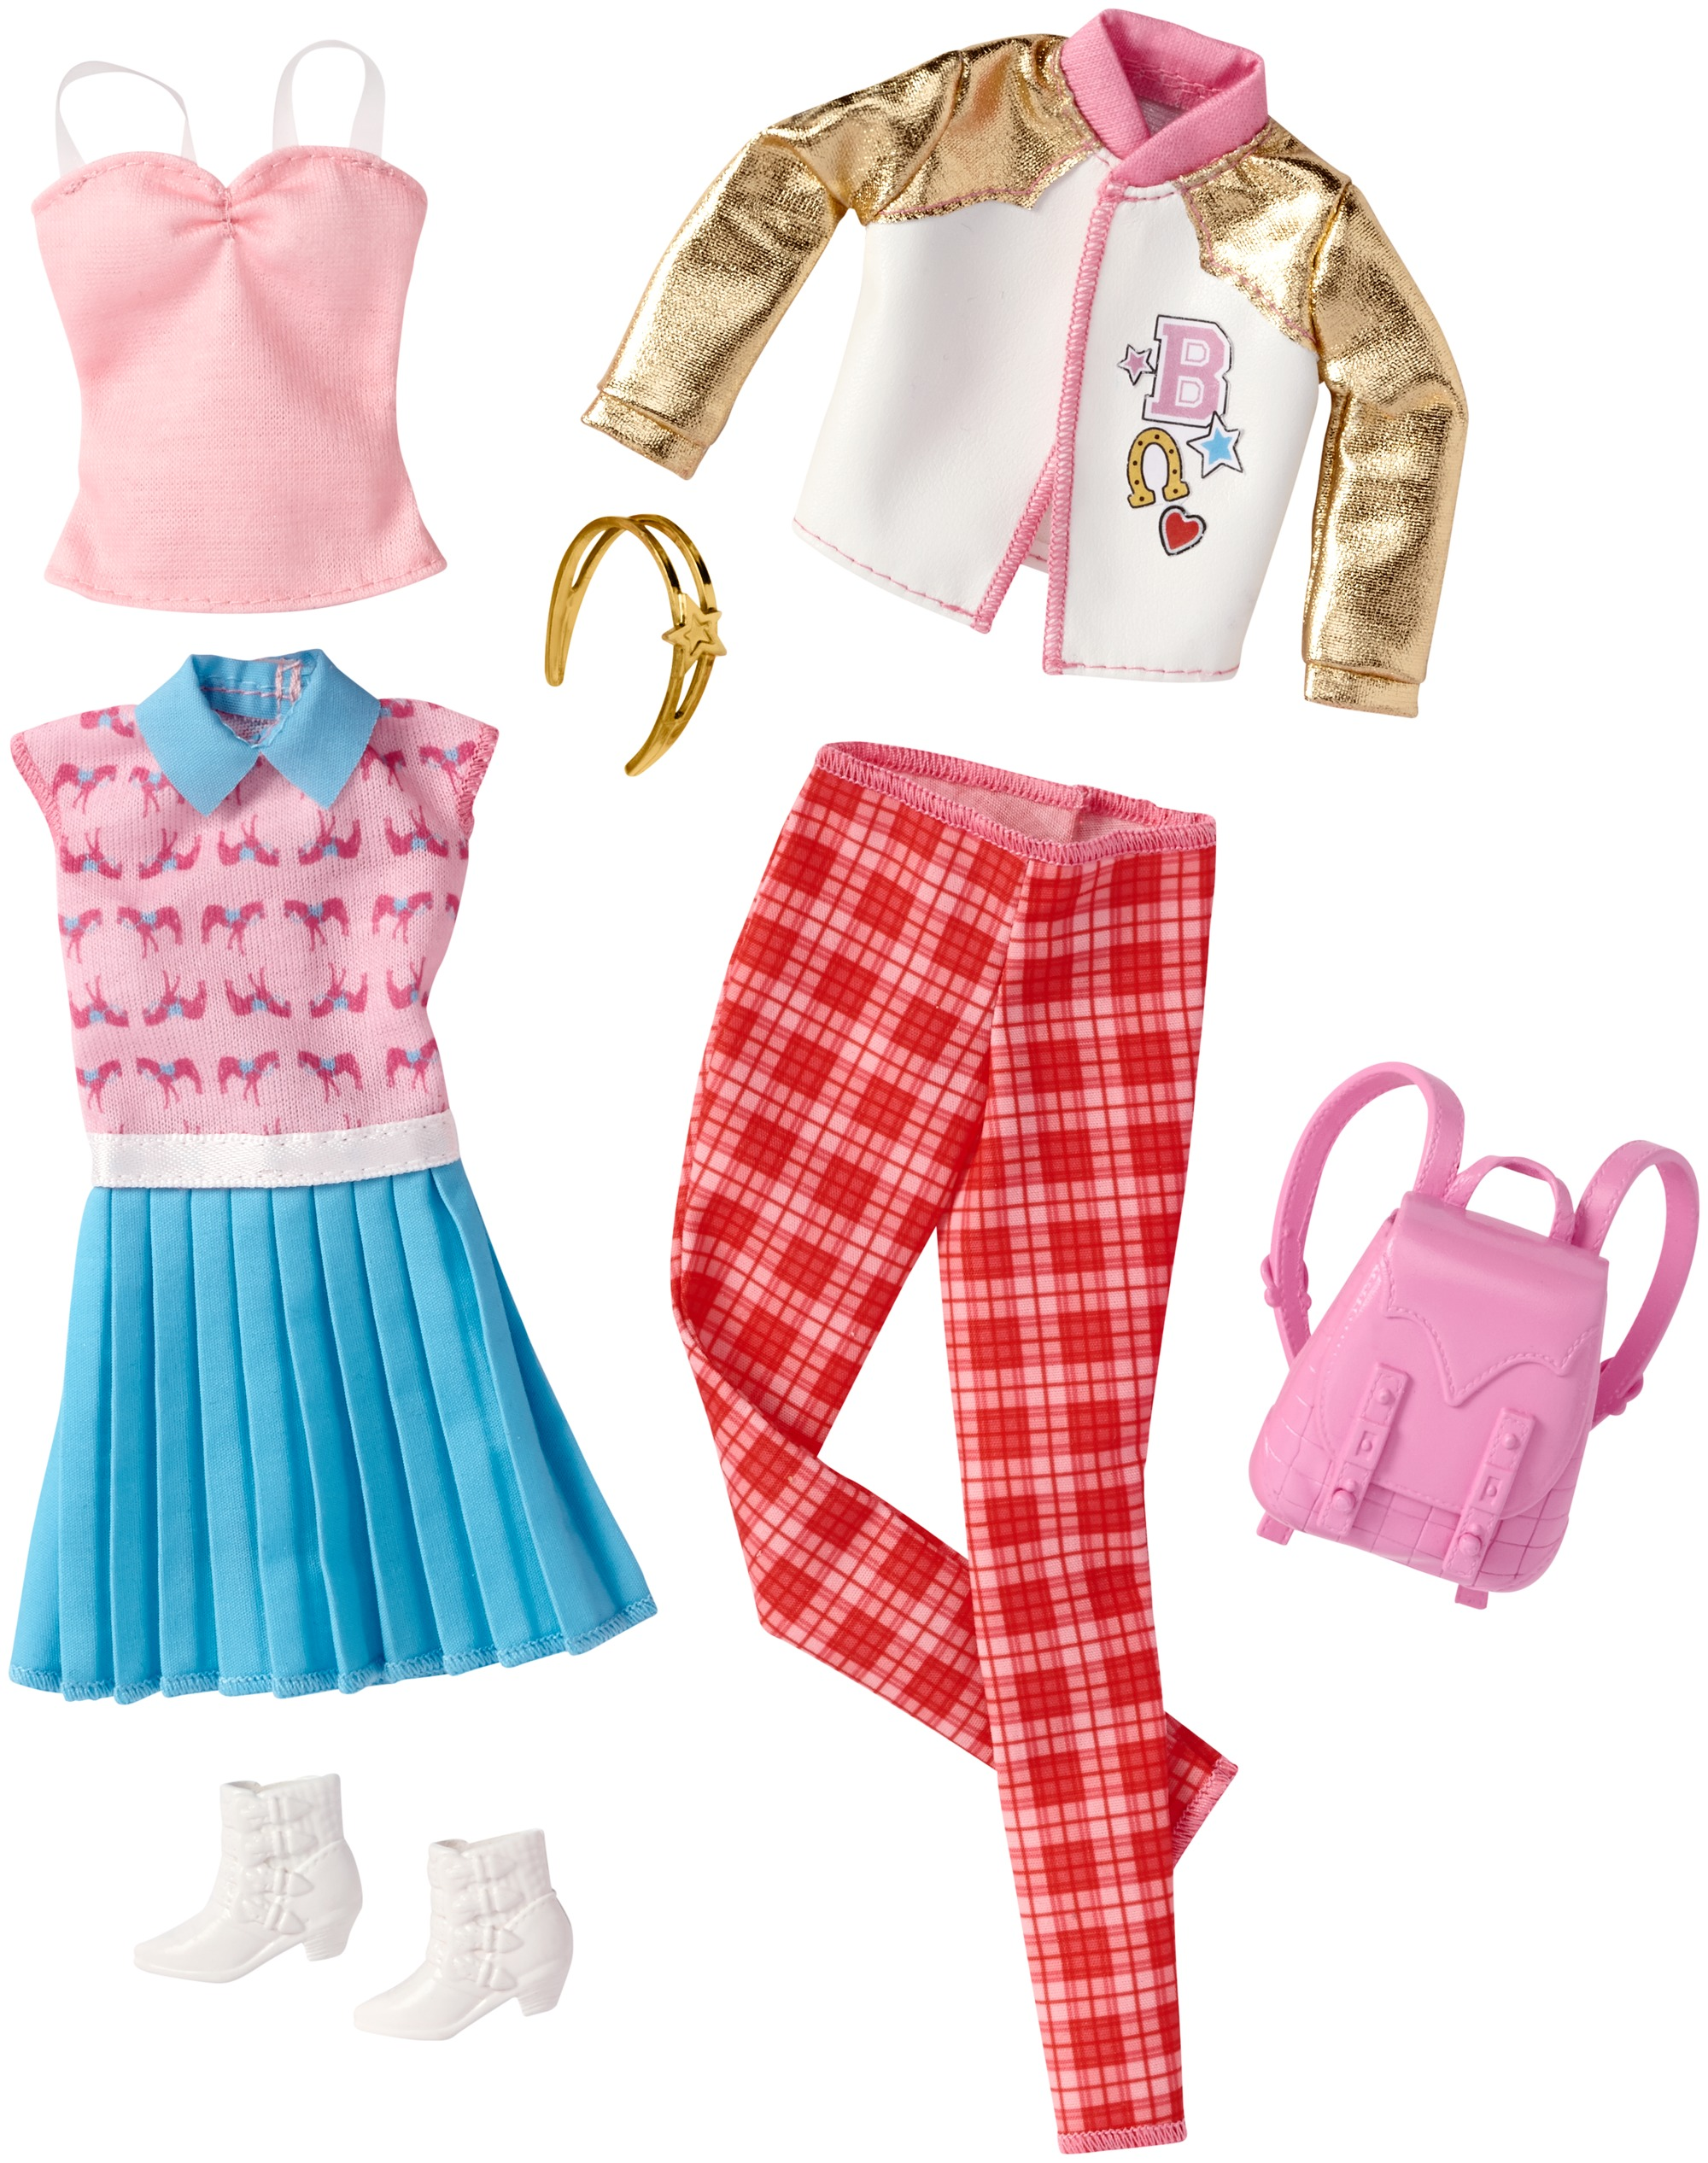 63ef31f8ab Barbie Fashion Outfit 2-Pack  8 - Walmart.com